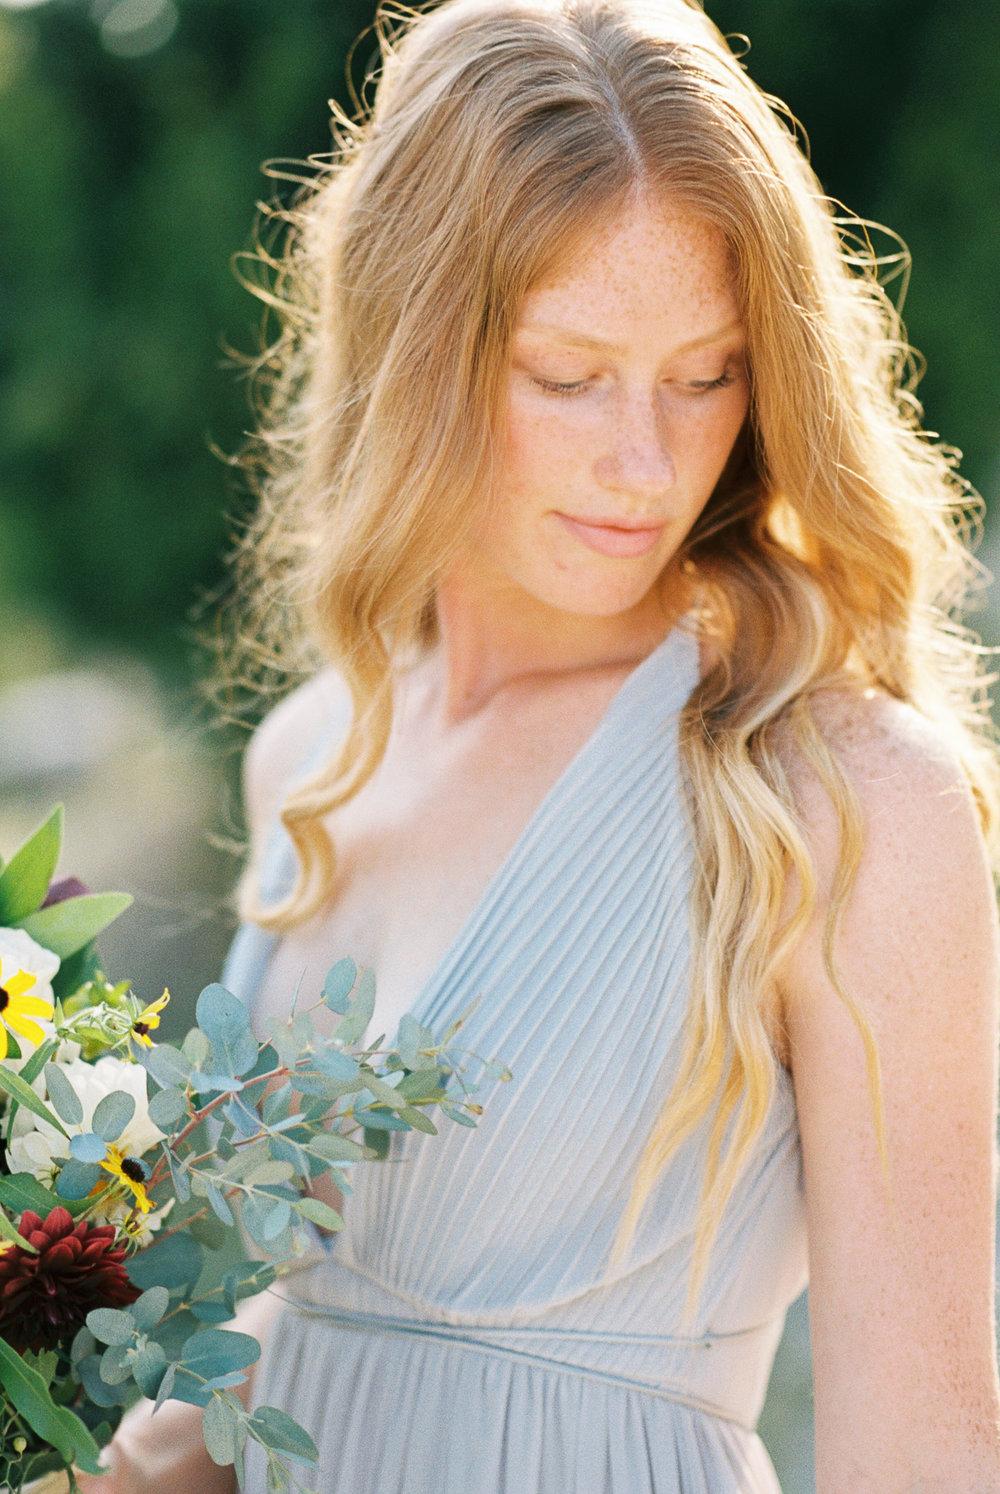 Fine_Art_Film_Wedding_Photographer_Tonya_Espy_Photography-96.jpg